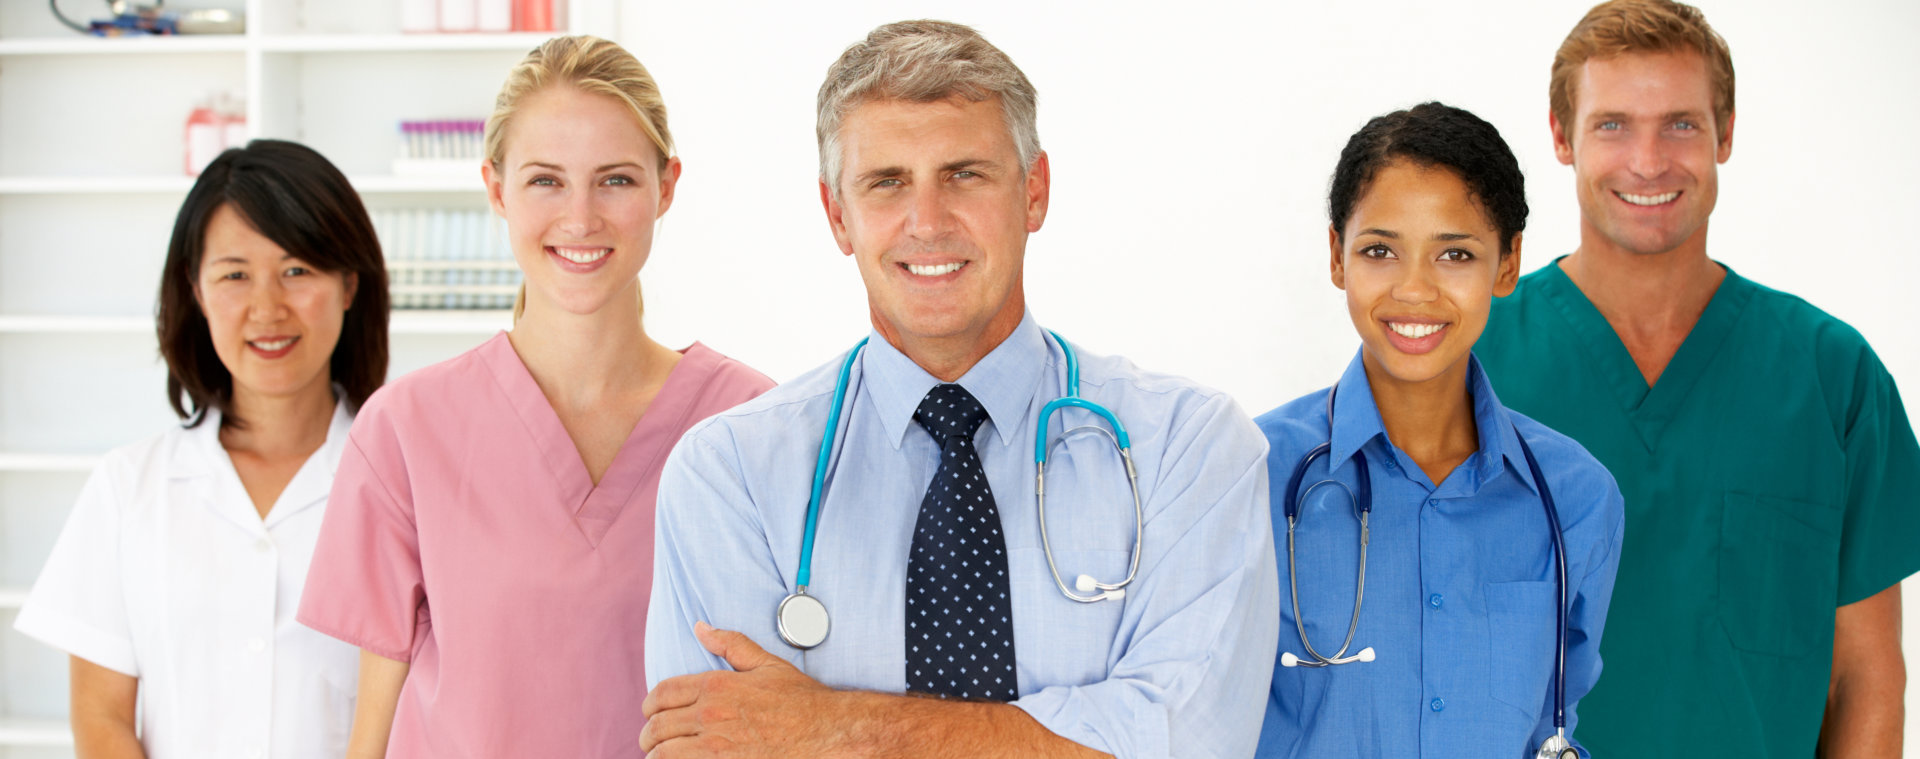 group medical staff